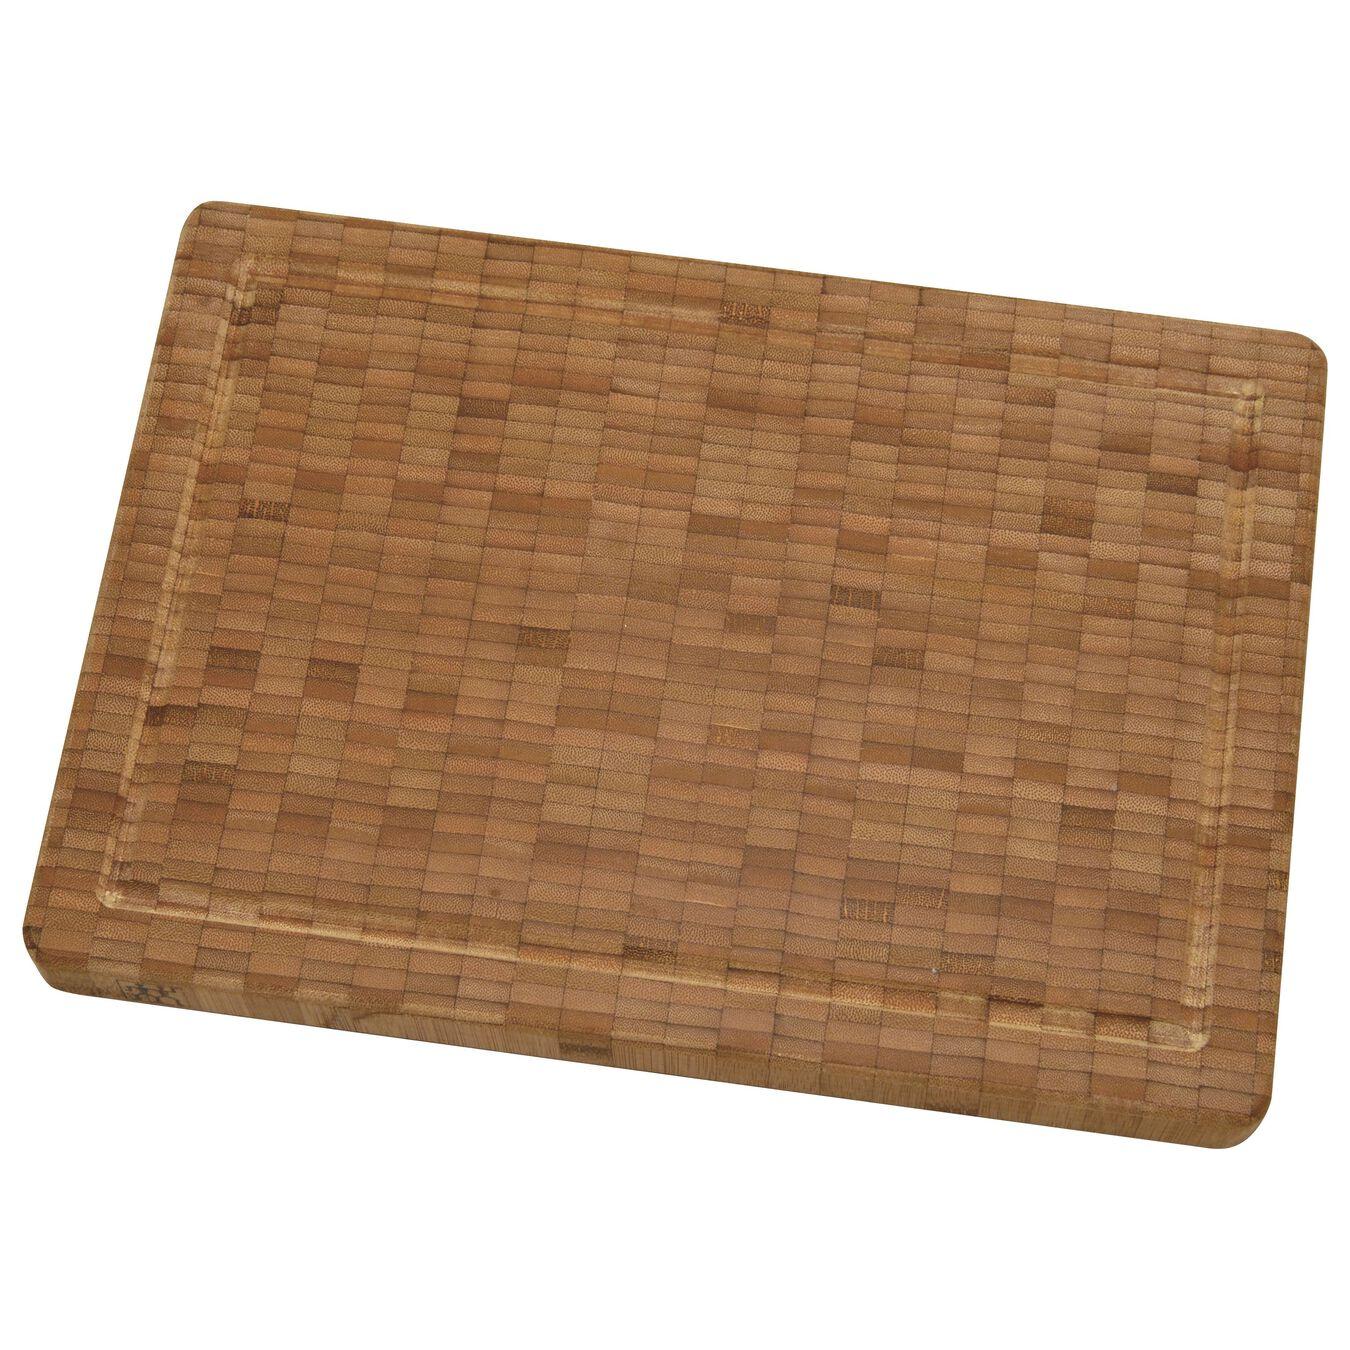 Tagliere - 36 cm x 25 cm, bamb,,large 1